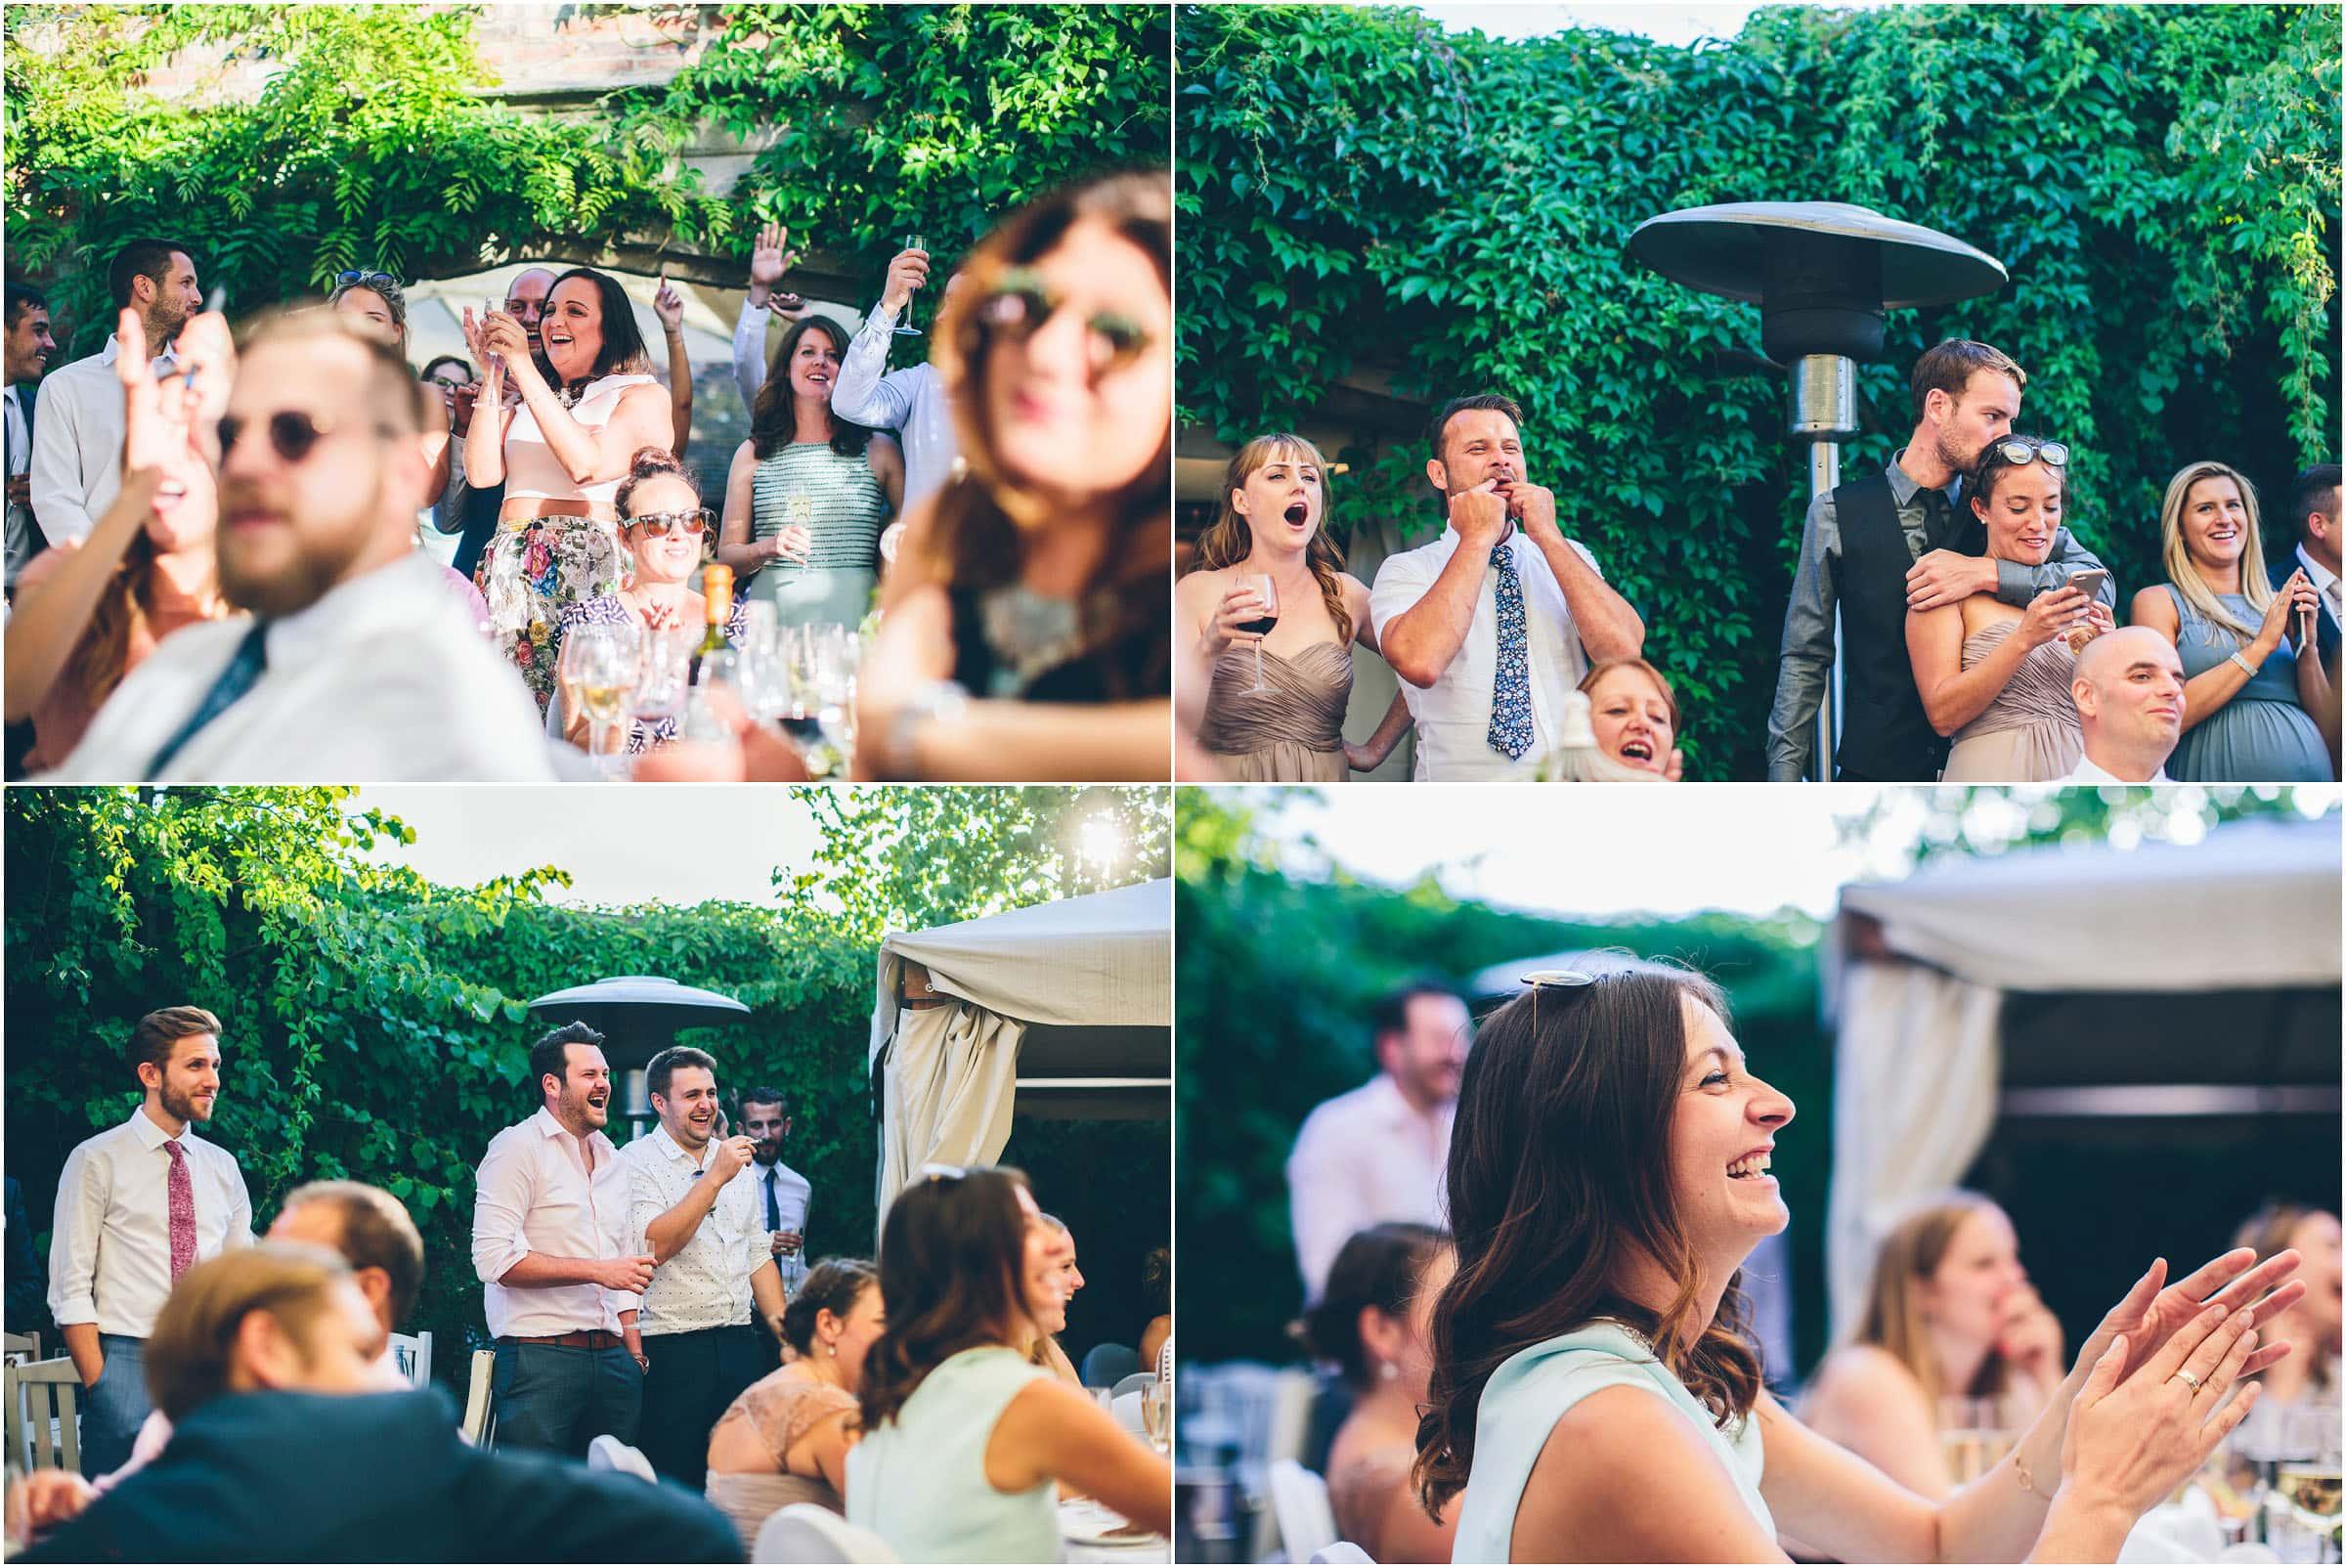 Kensington_Roof_Gardens_Wedding_Photography_0094